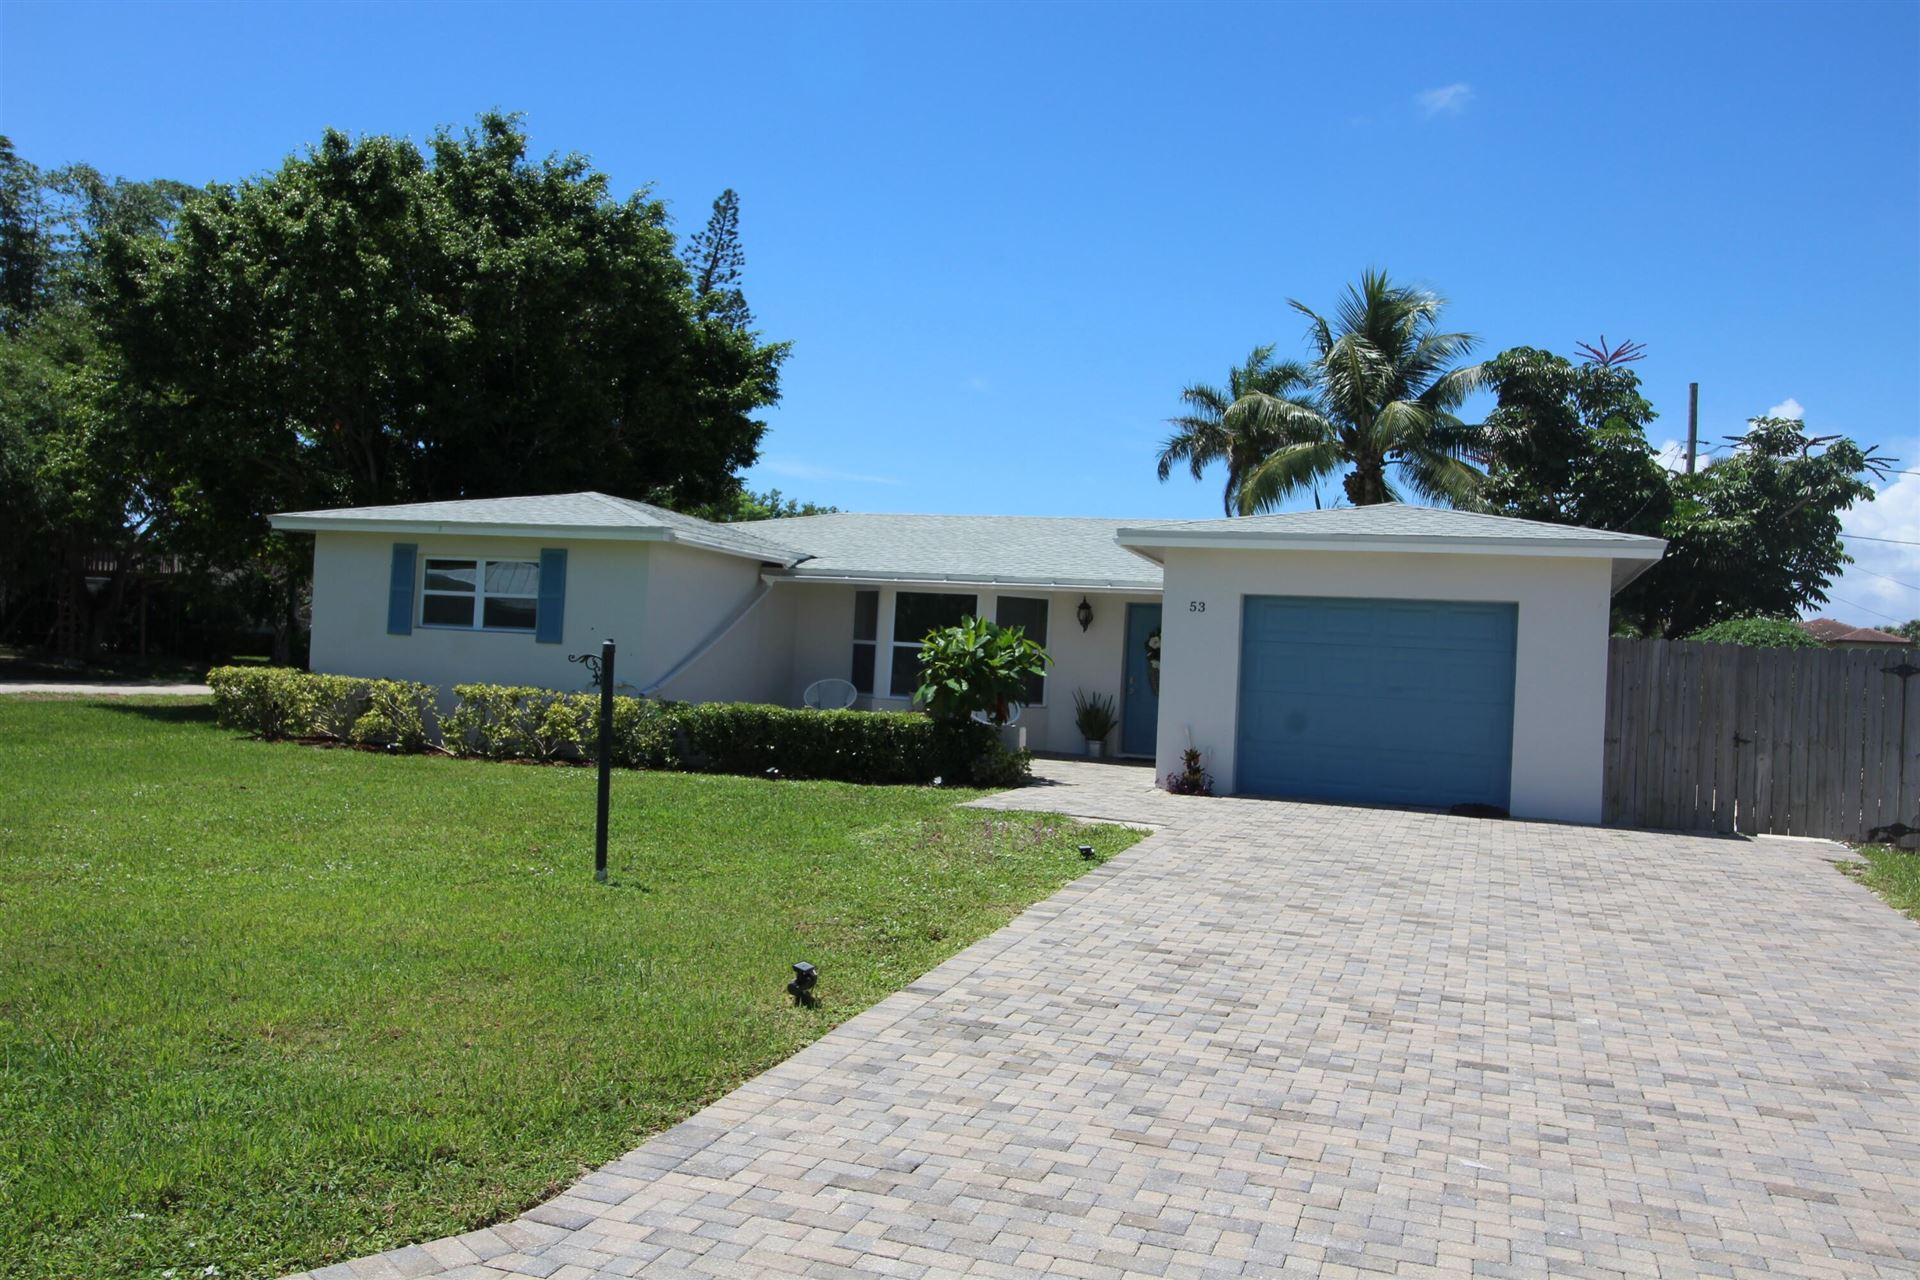 53 Palamino Circle, Boca Raton, FL 33487 - MLS#: RX-10727191